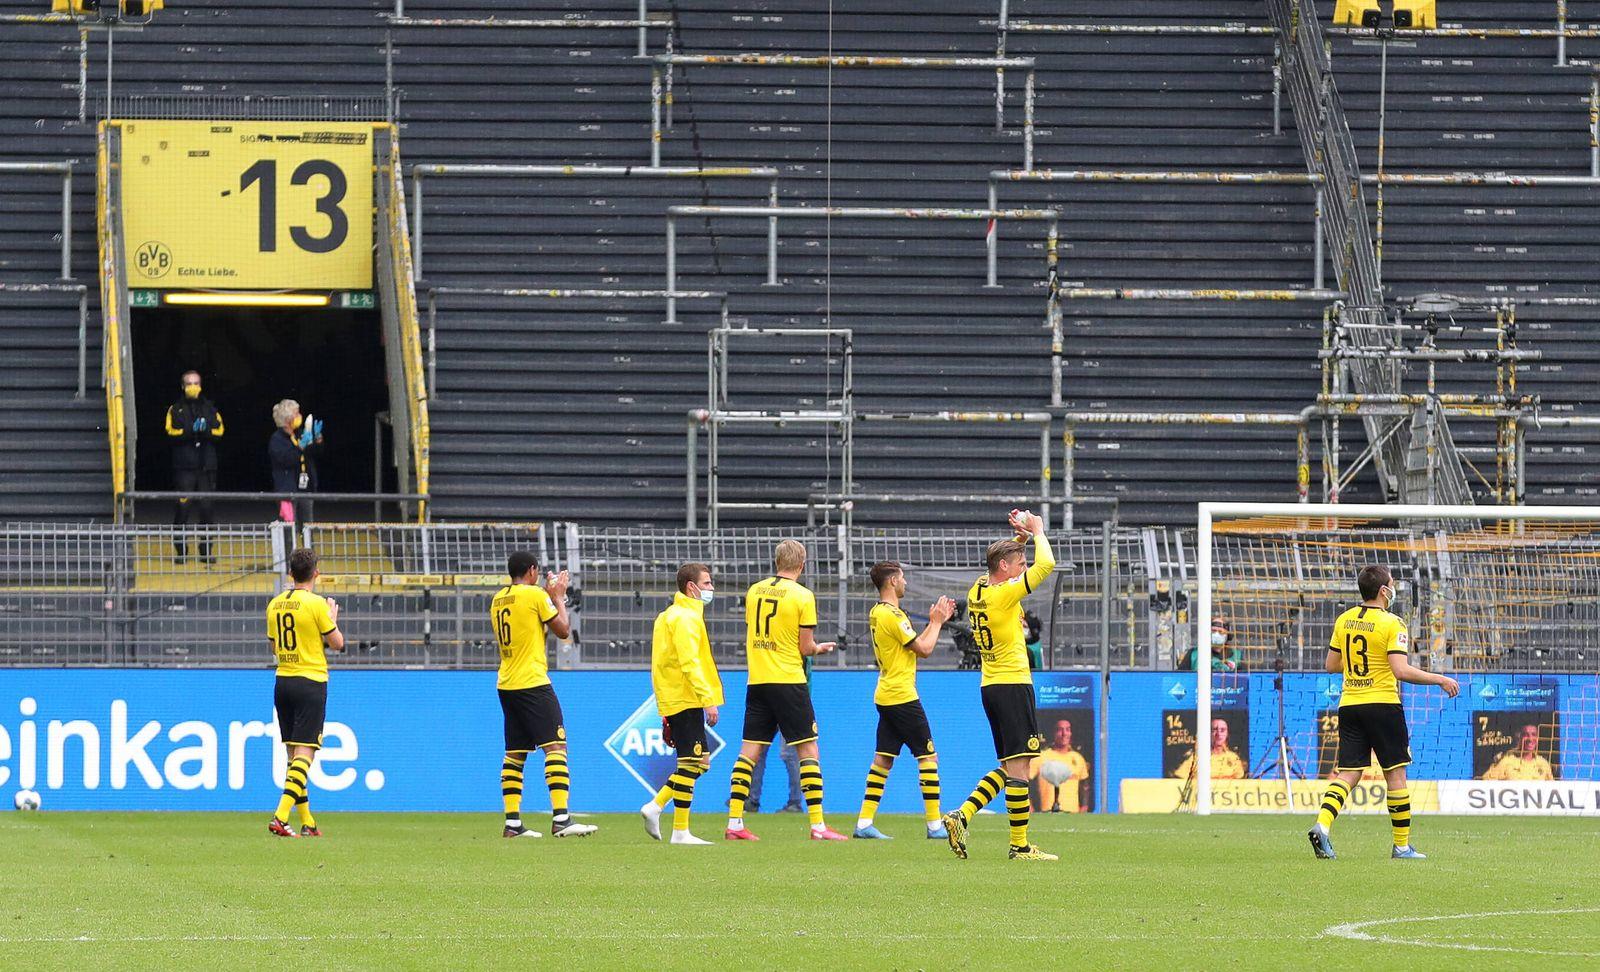 Borussia Dortmund - FC Schalke 04 Welle , Schlussjubel , la ola , laola , vor der leeren Südtribüne , Geisterspiel , le